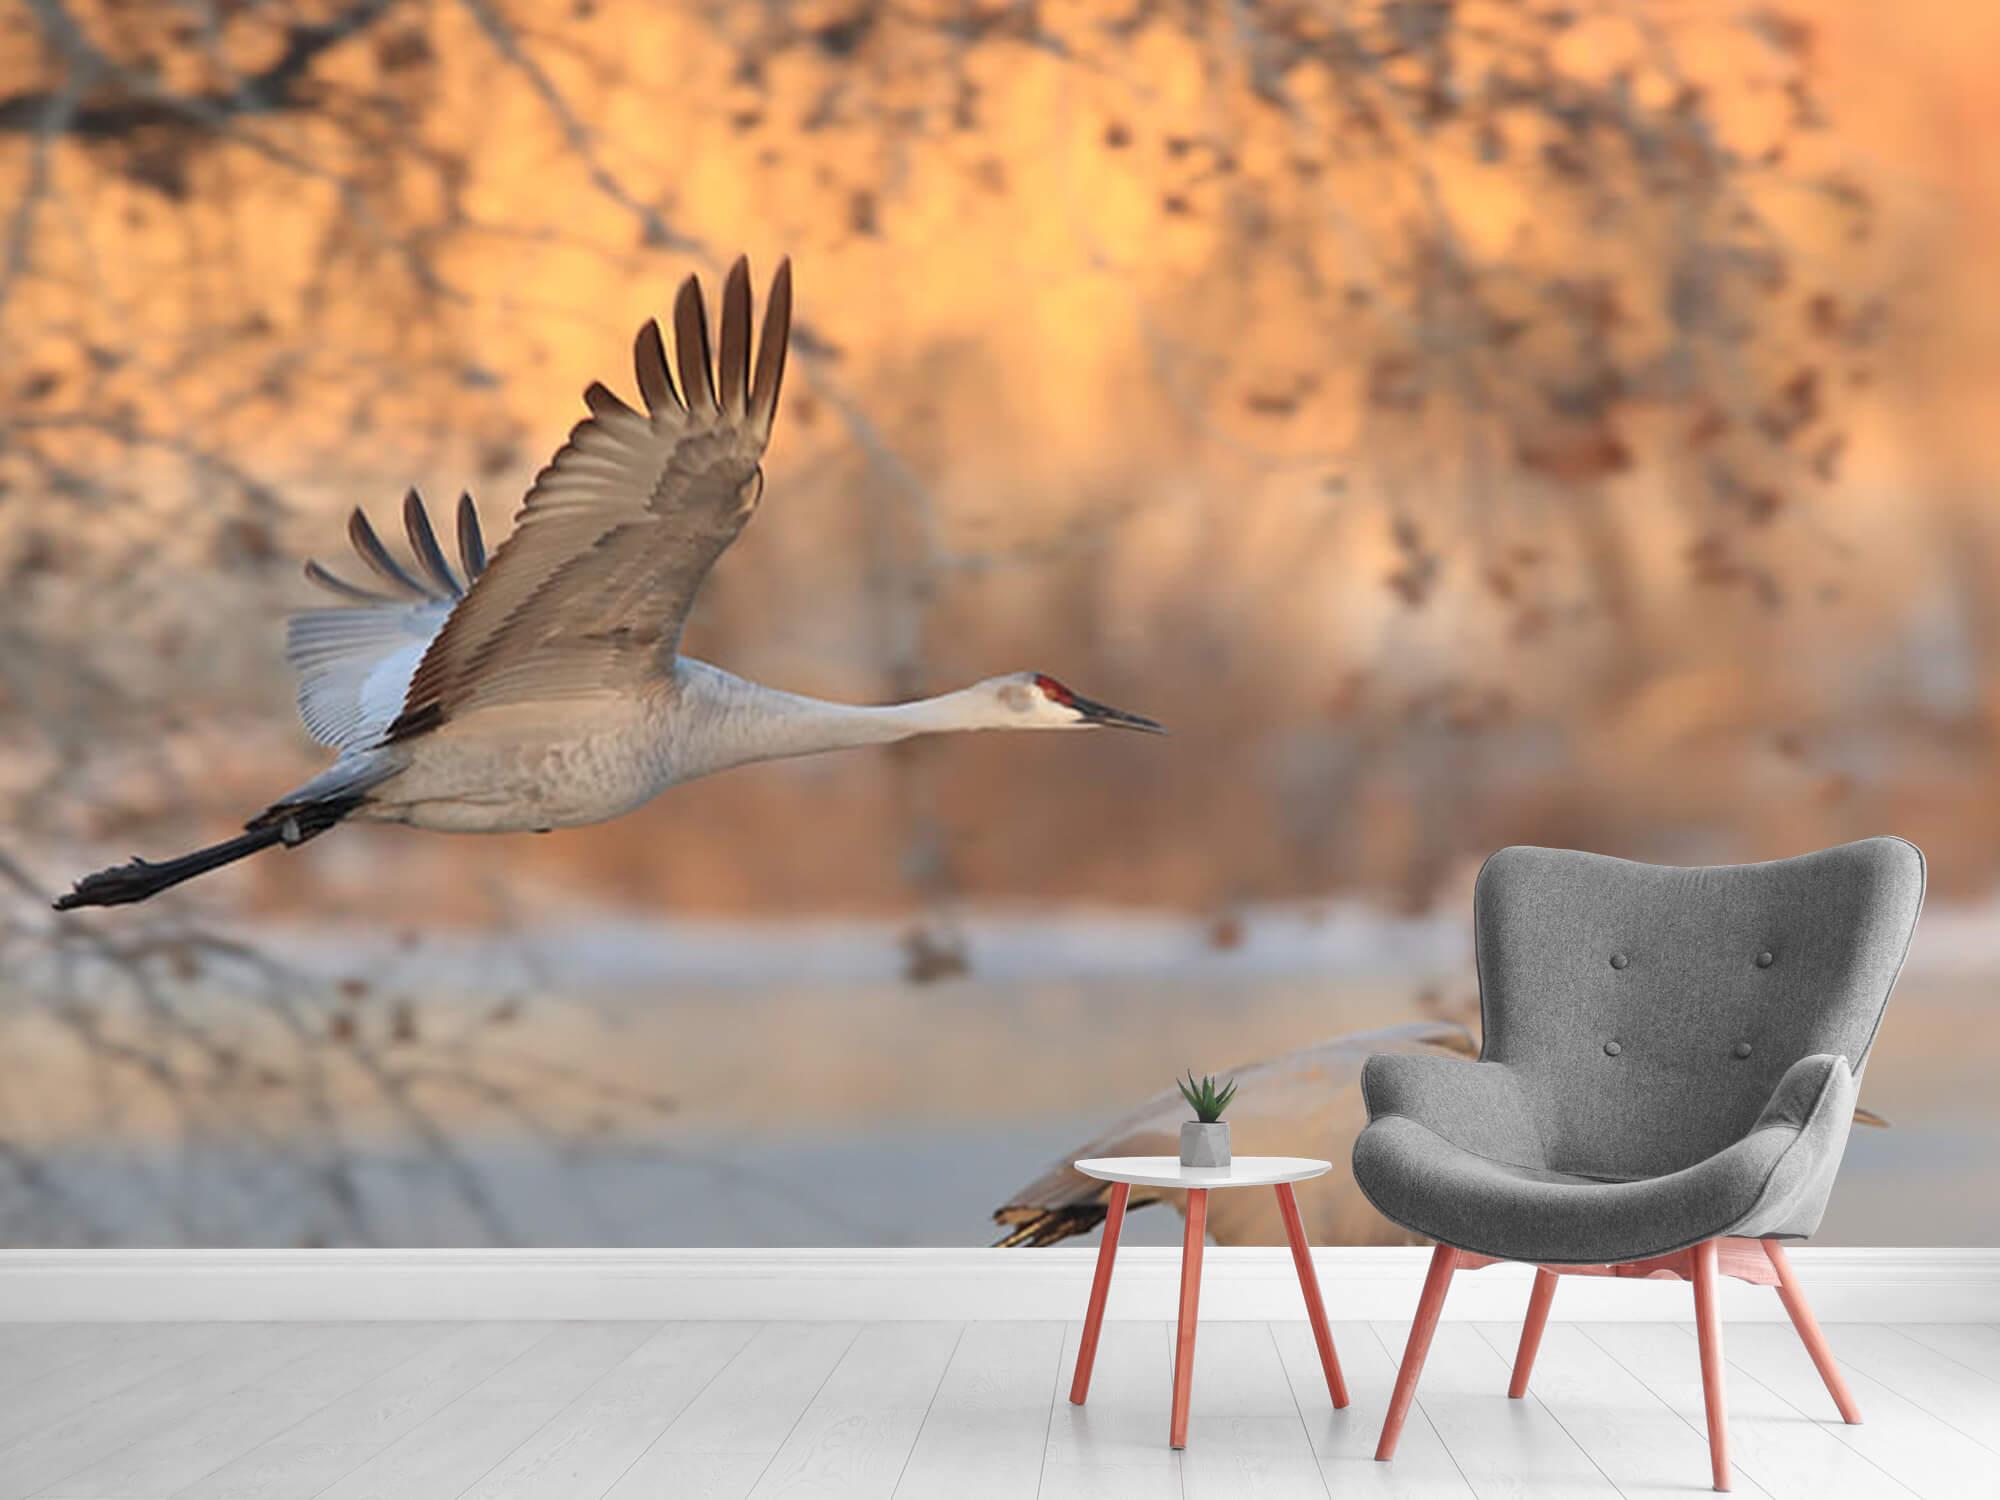 Vliegende kraanvogels 2